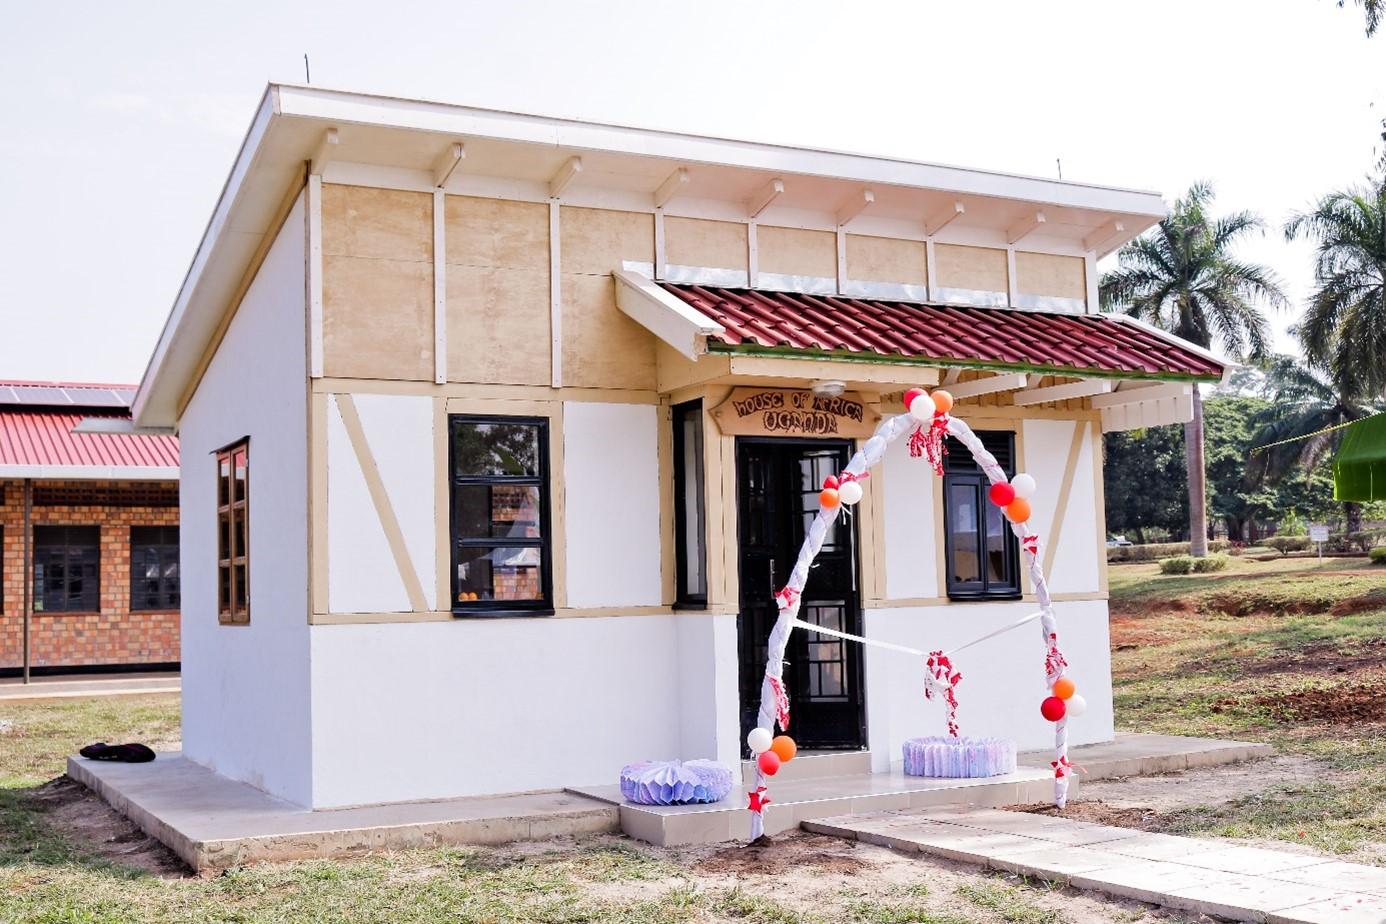 House of Africa in Hoima, Uganda. Foto: © GIZ